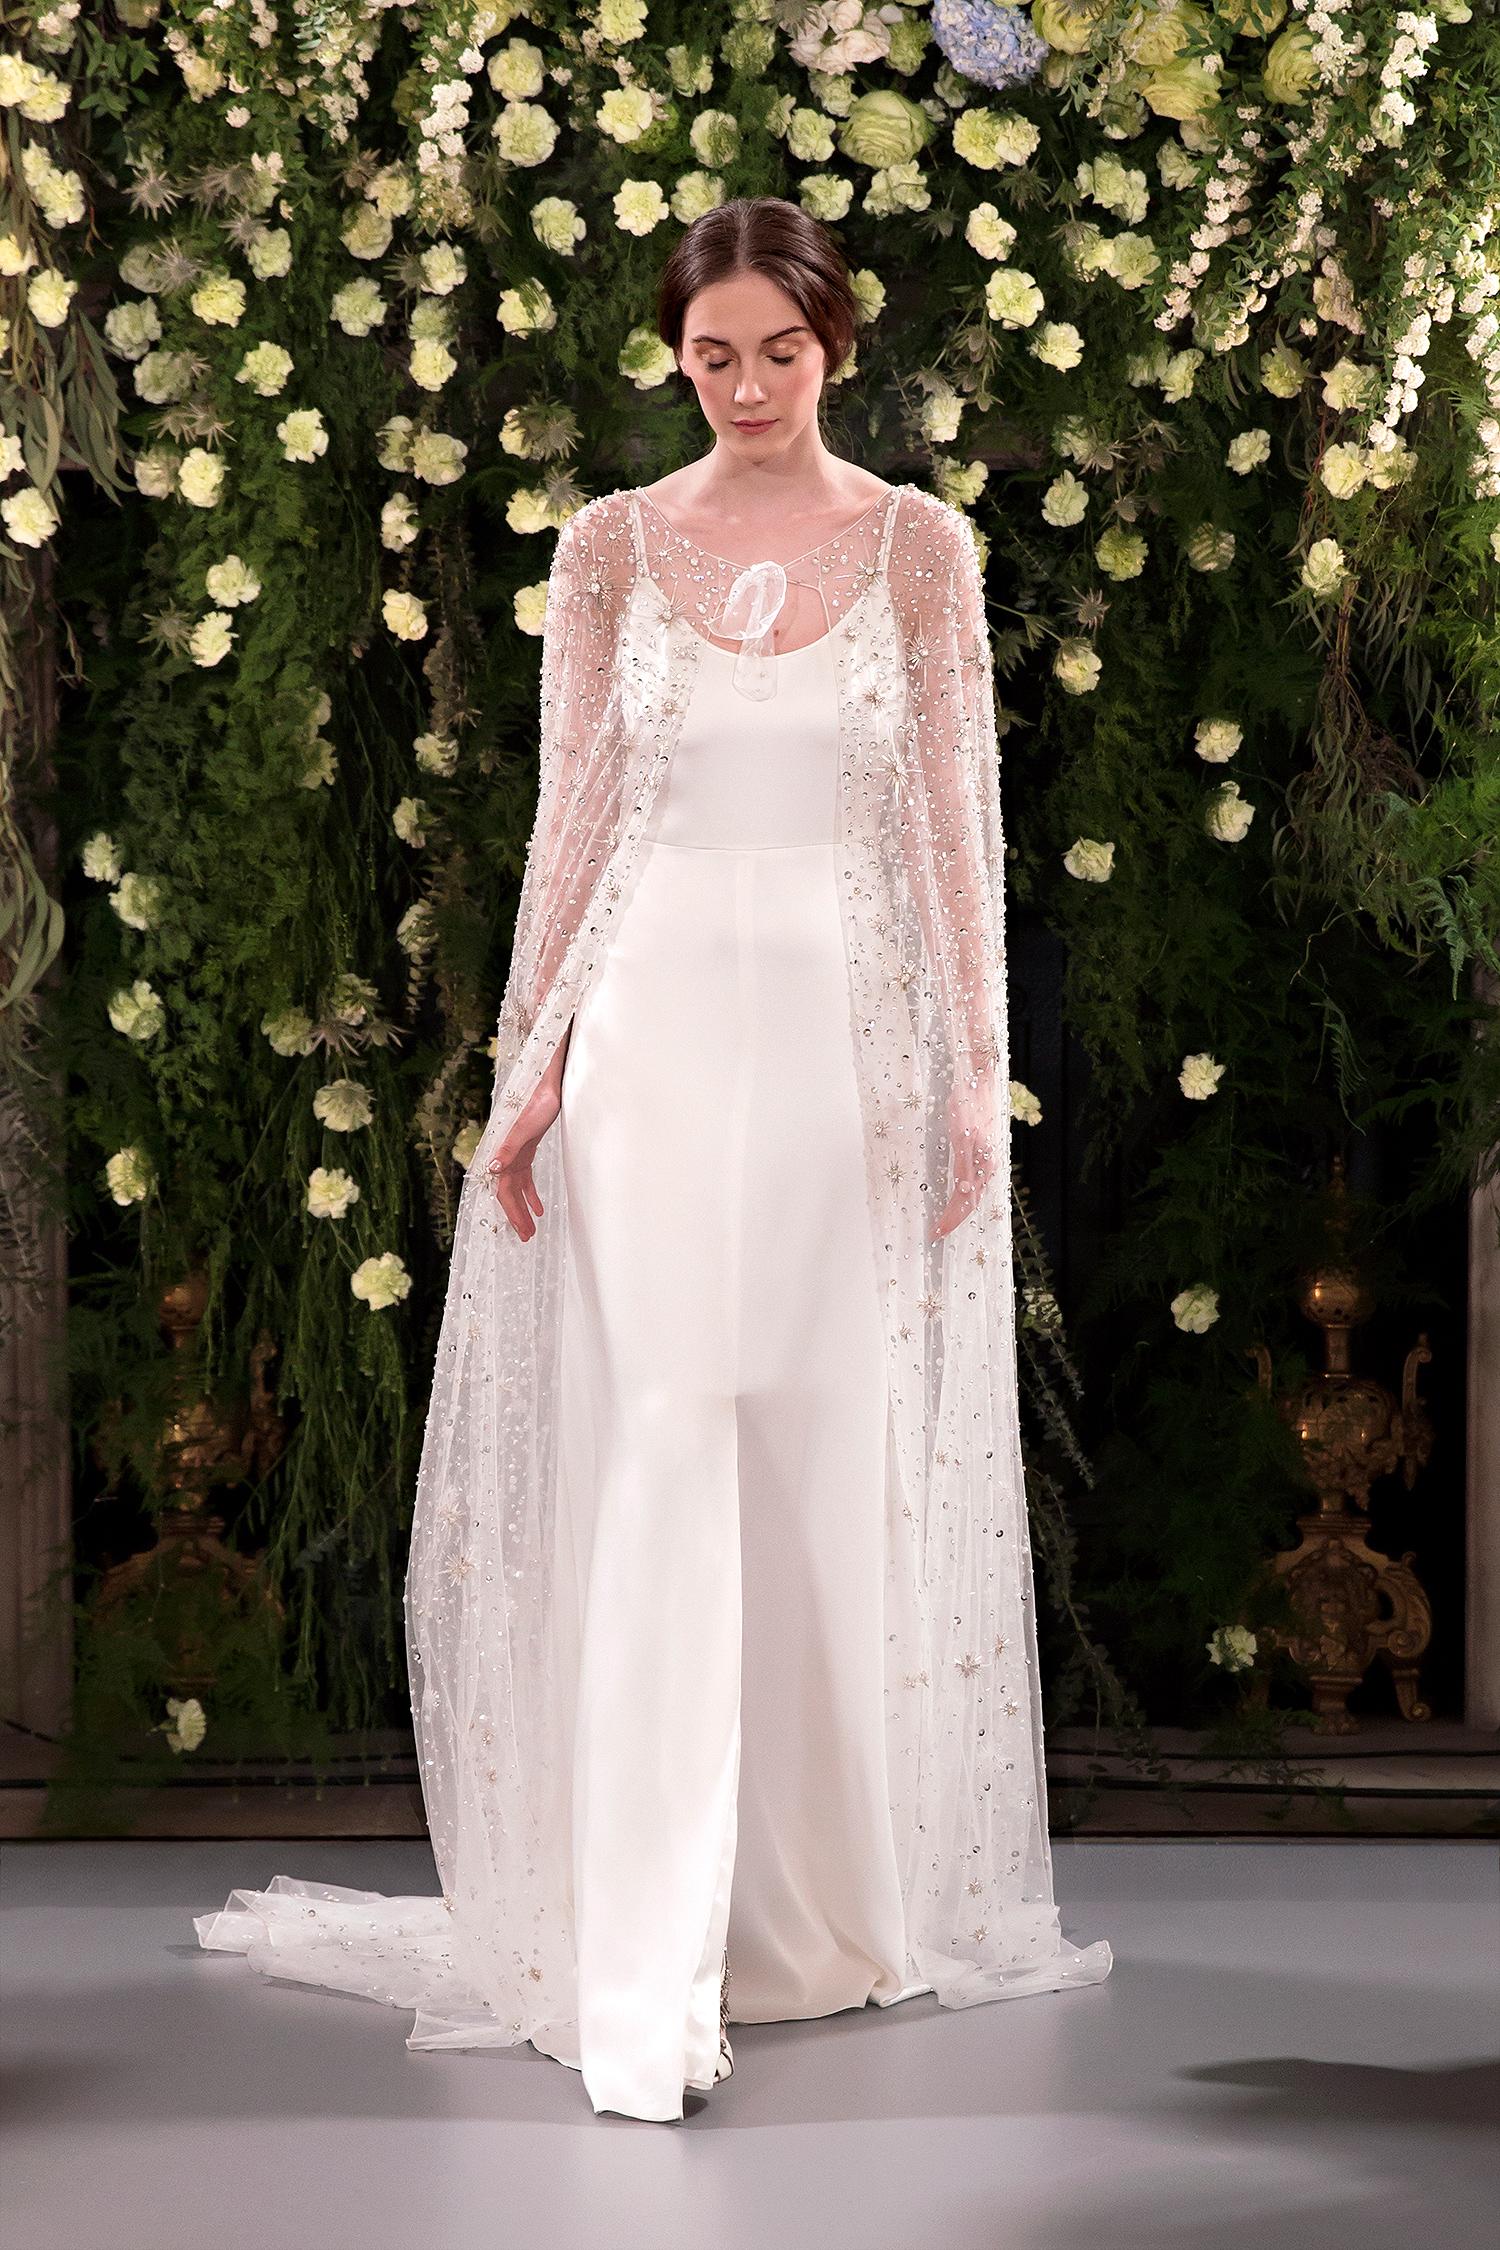 jenny packham wedding dress spring 2019 spaghetti strap with beaded cape